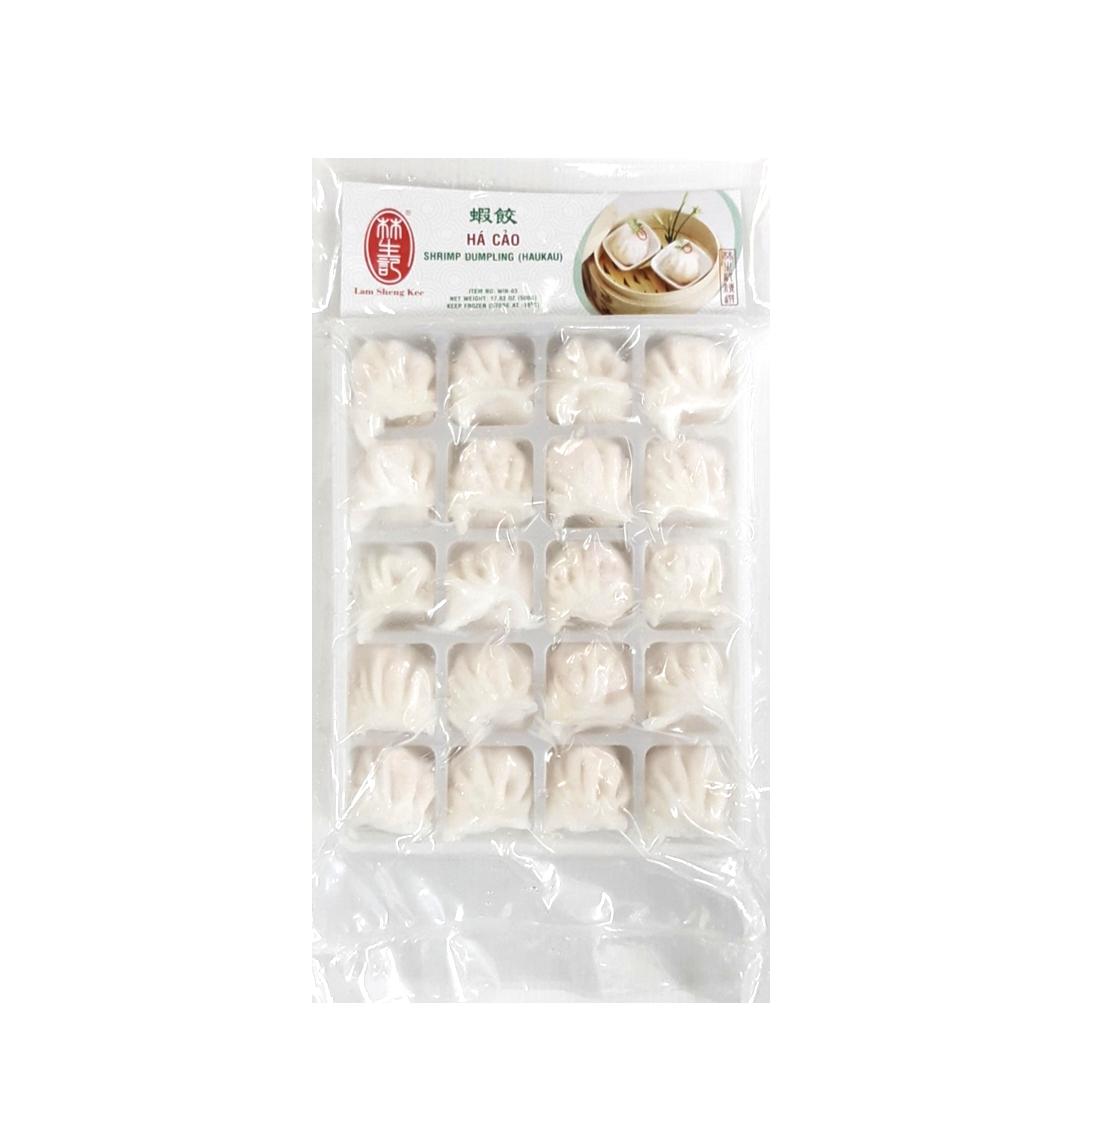 林生记 虾饺 ~500g(17.6 oz) Shrimp Dumpling (HAUKAU) 500g(17.6 oz)